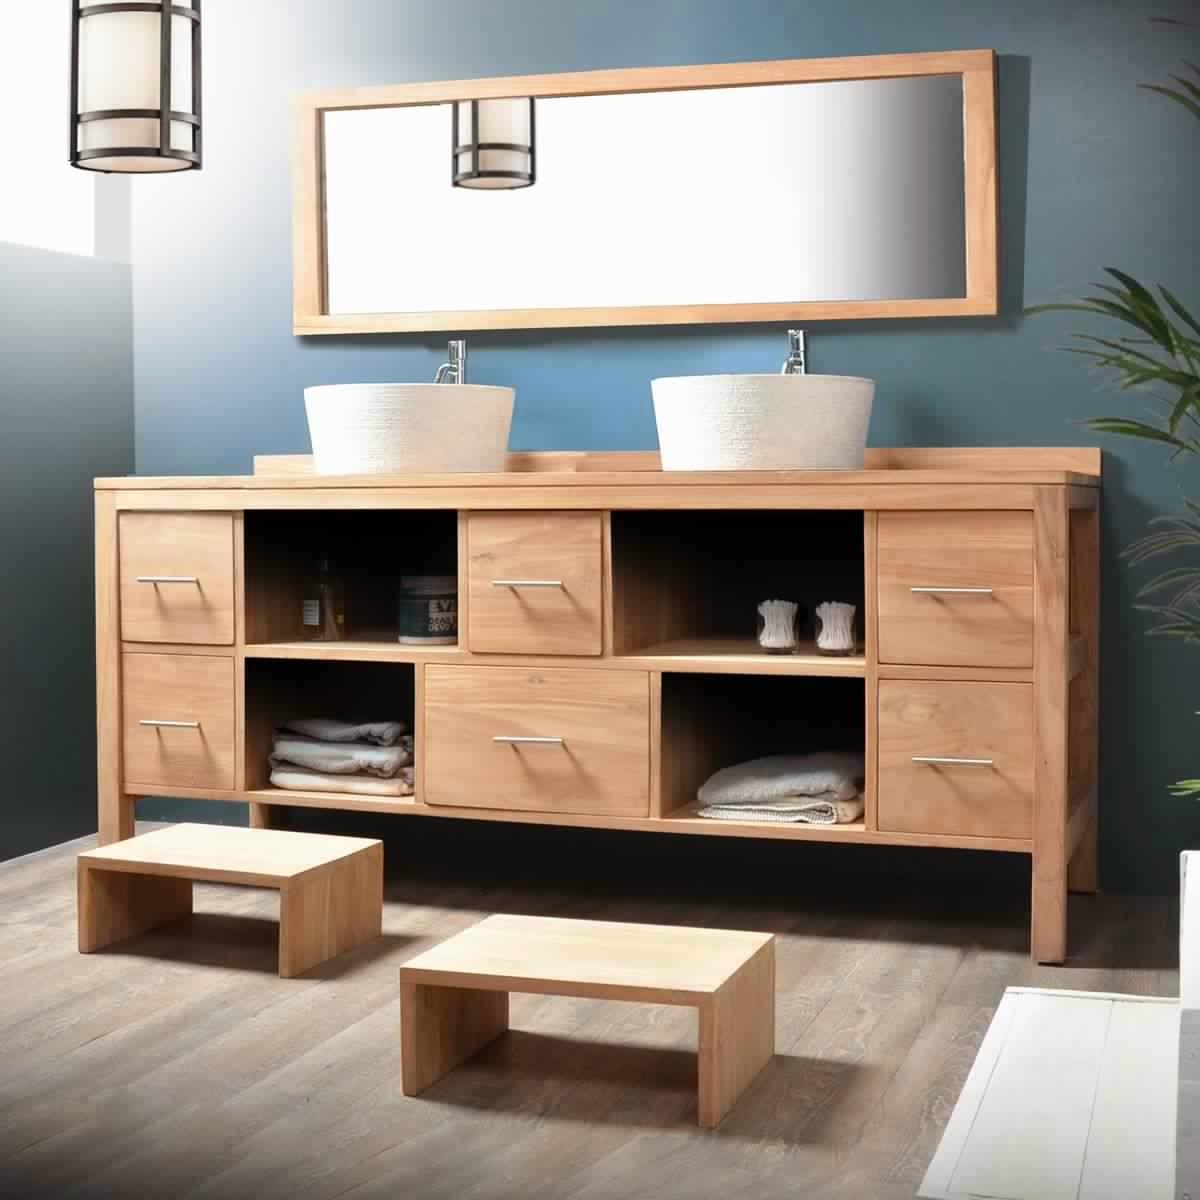 Meuble salle de bain bois 2 vasques meuble d coration maison for Photo meuble salle de bain